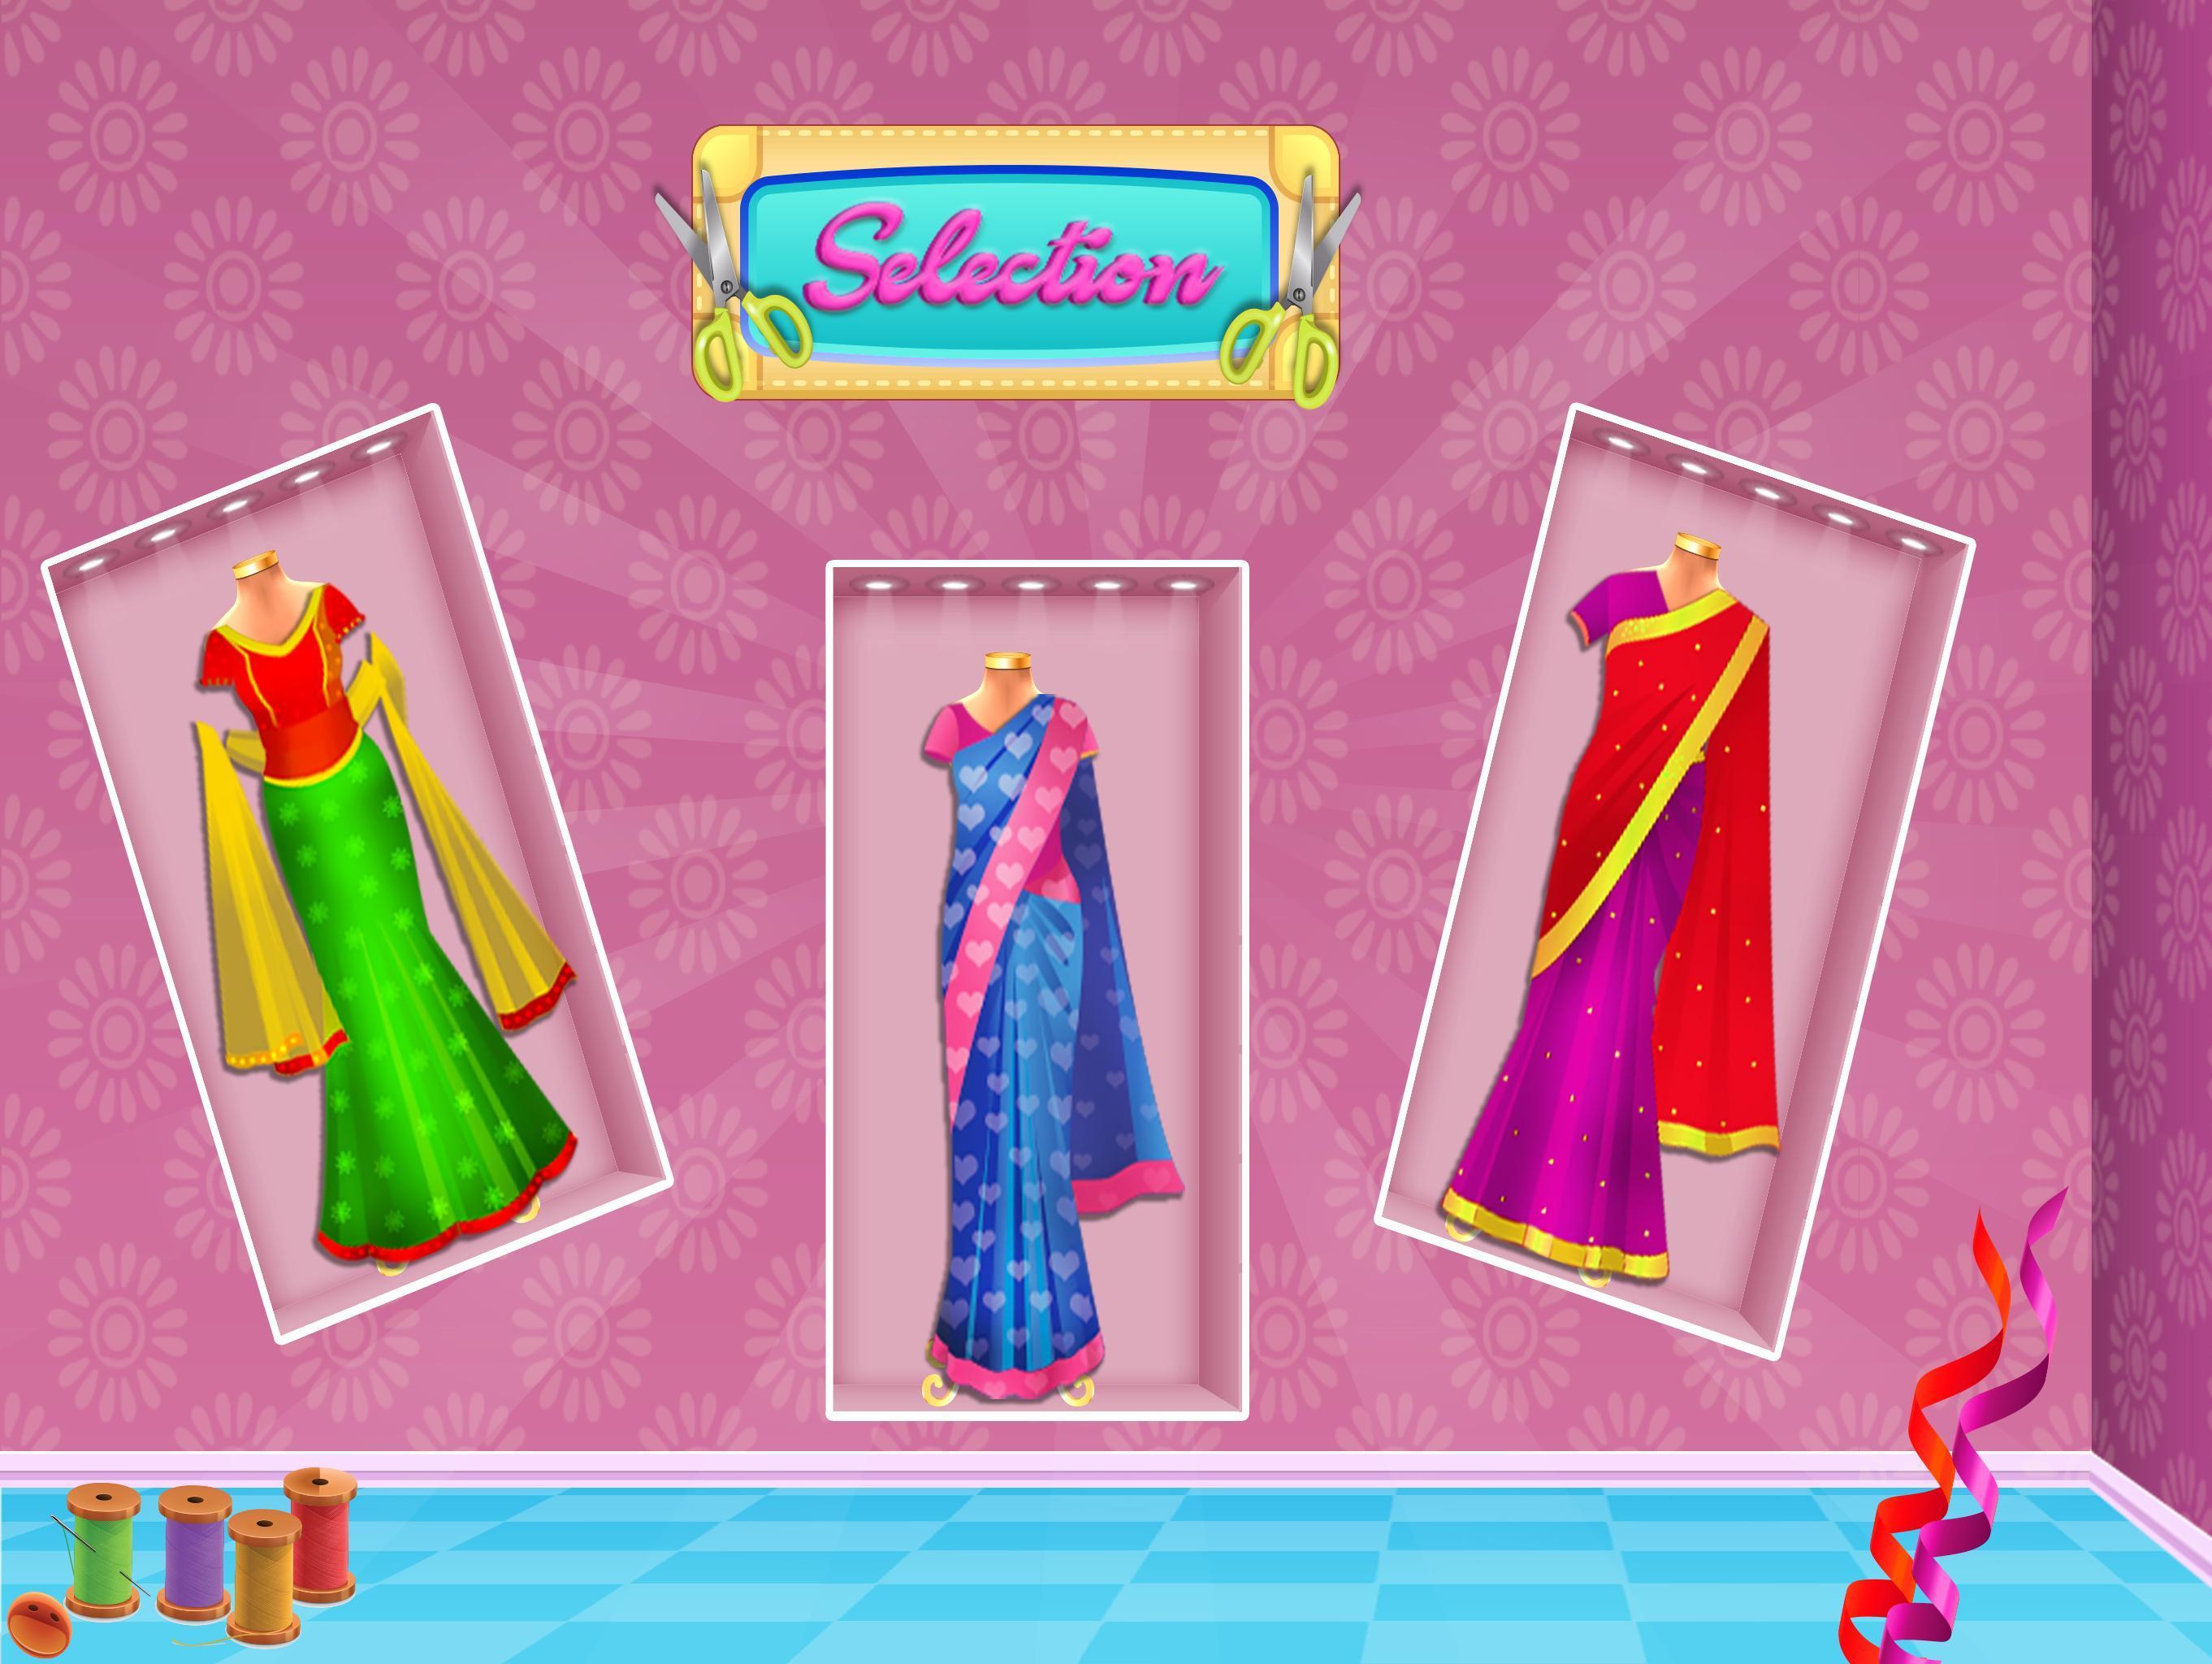 Indian Wedding Dress Tailor Little Style Boutique 1.0.4 Screenshot 10